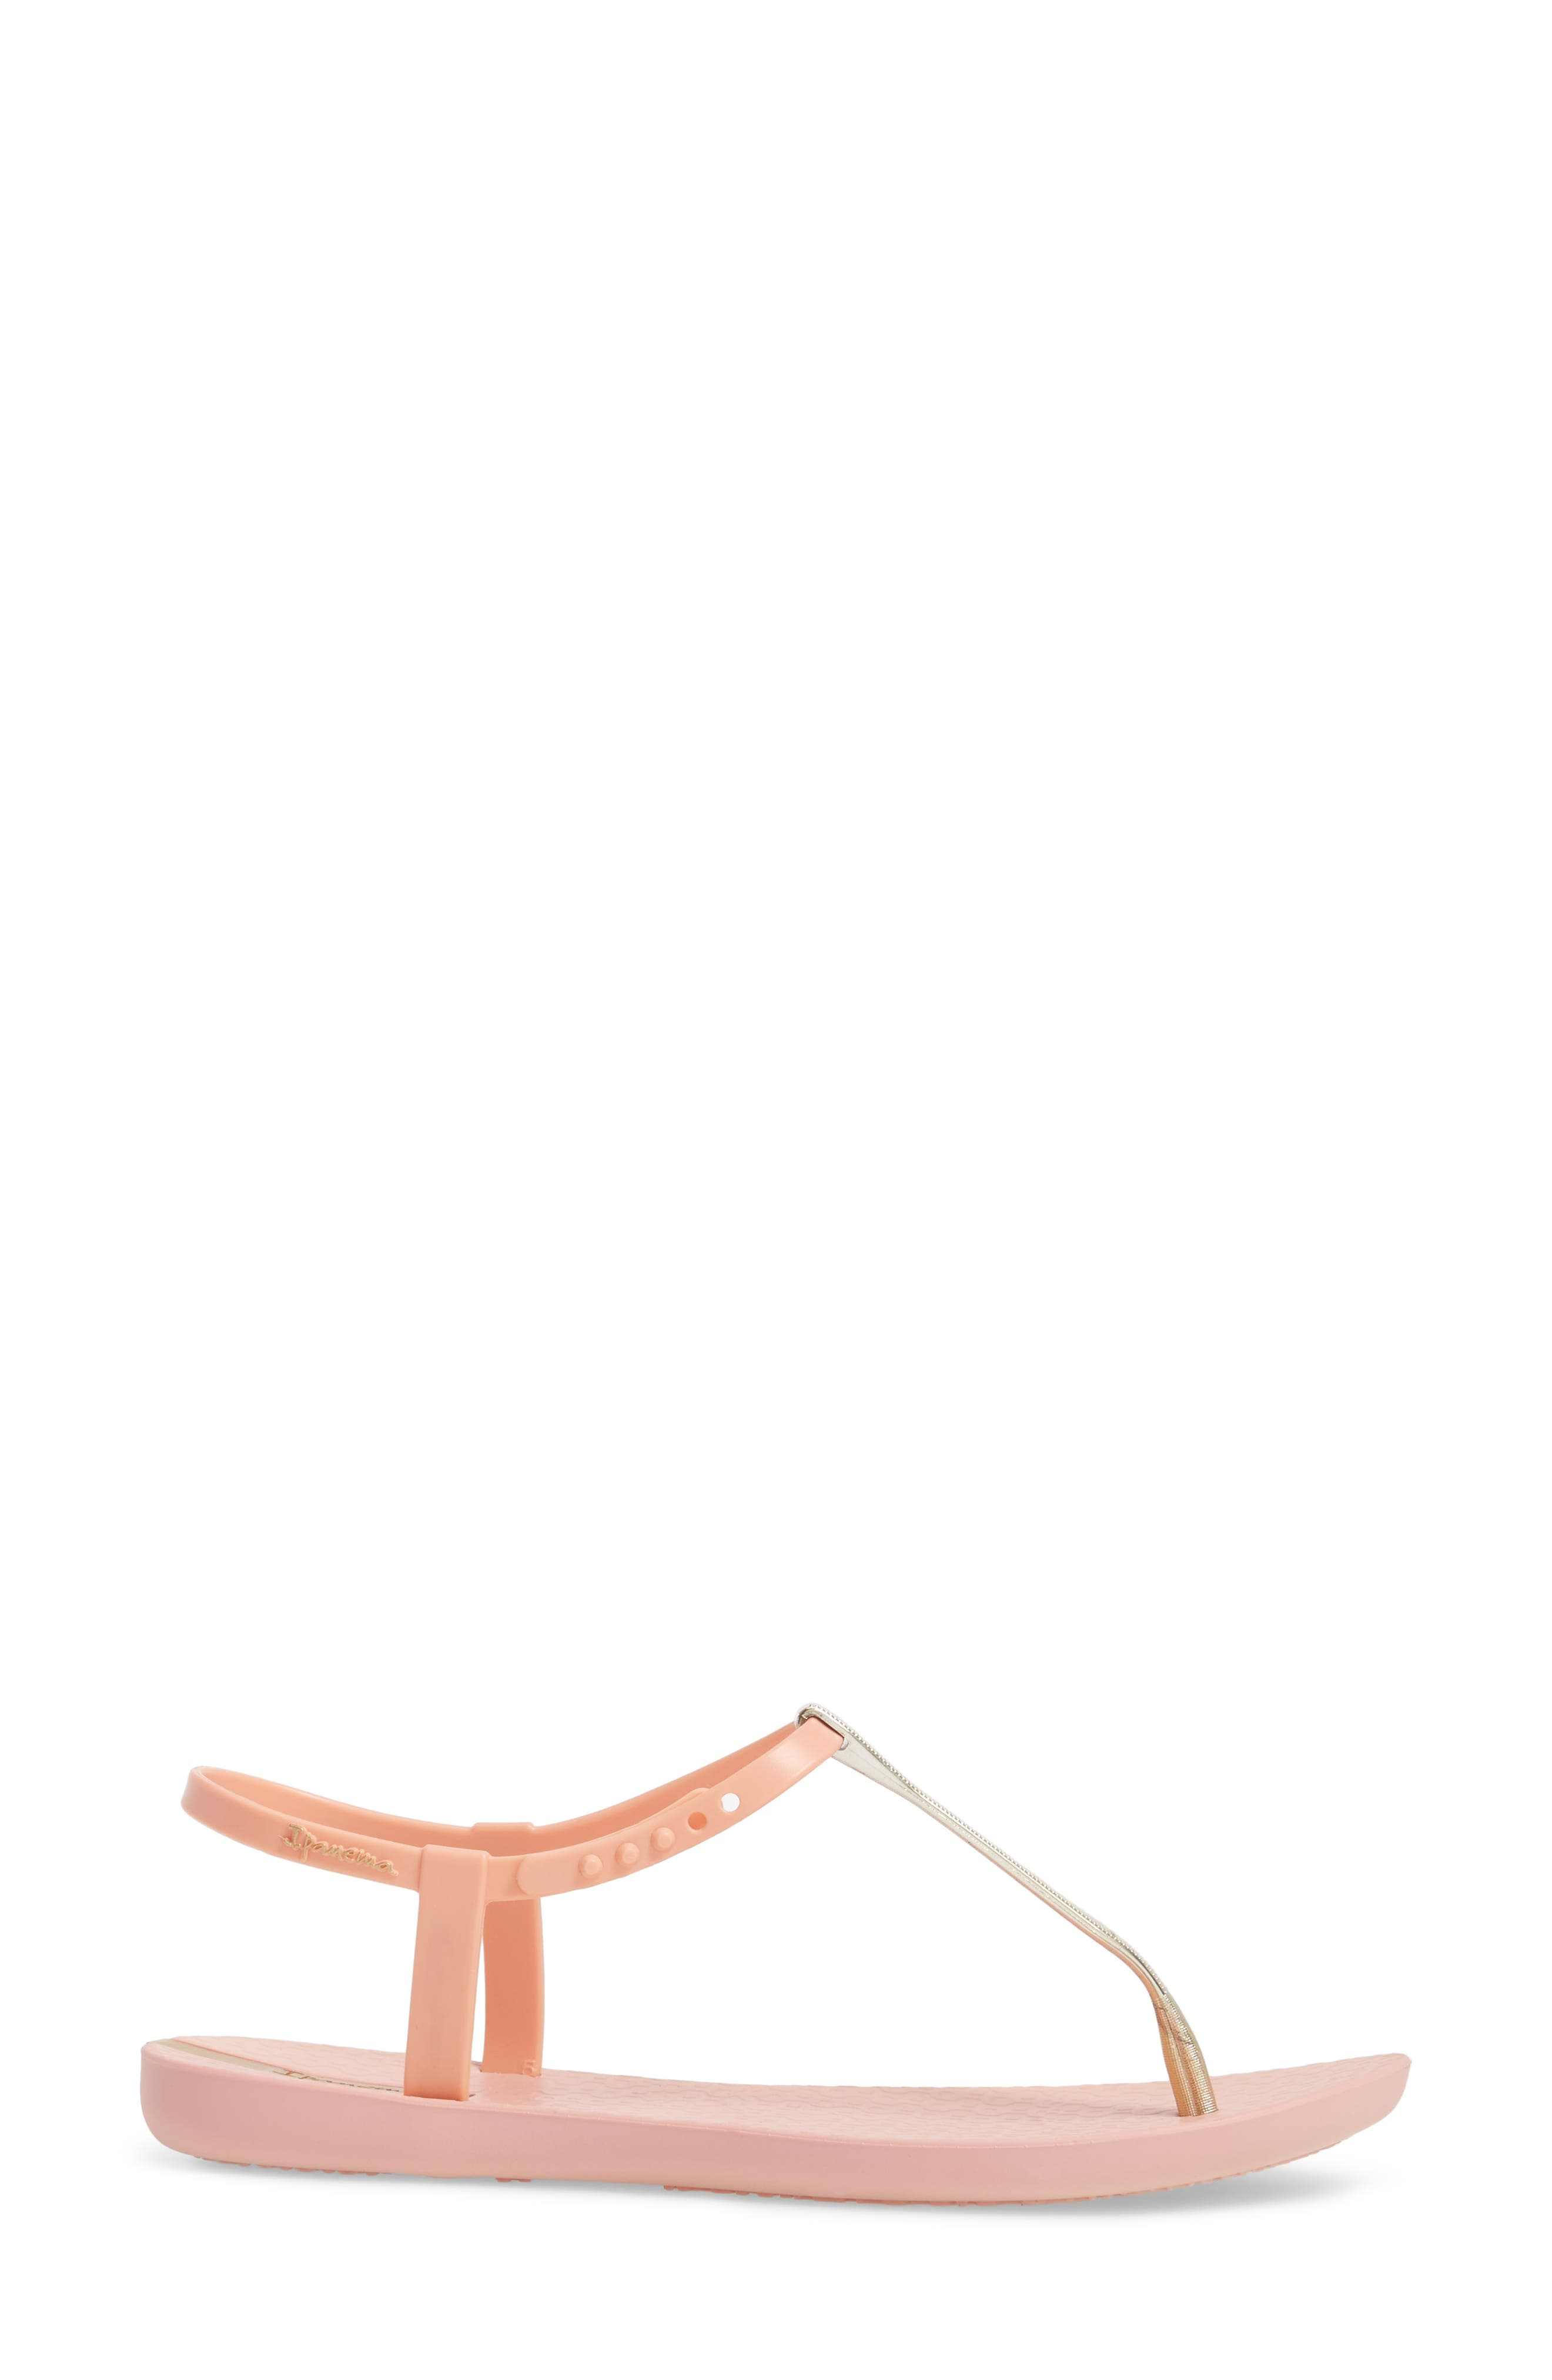 Bandeau Sandal,                             Alternate thumbnail 3, color,                             Pink/ Gold